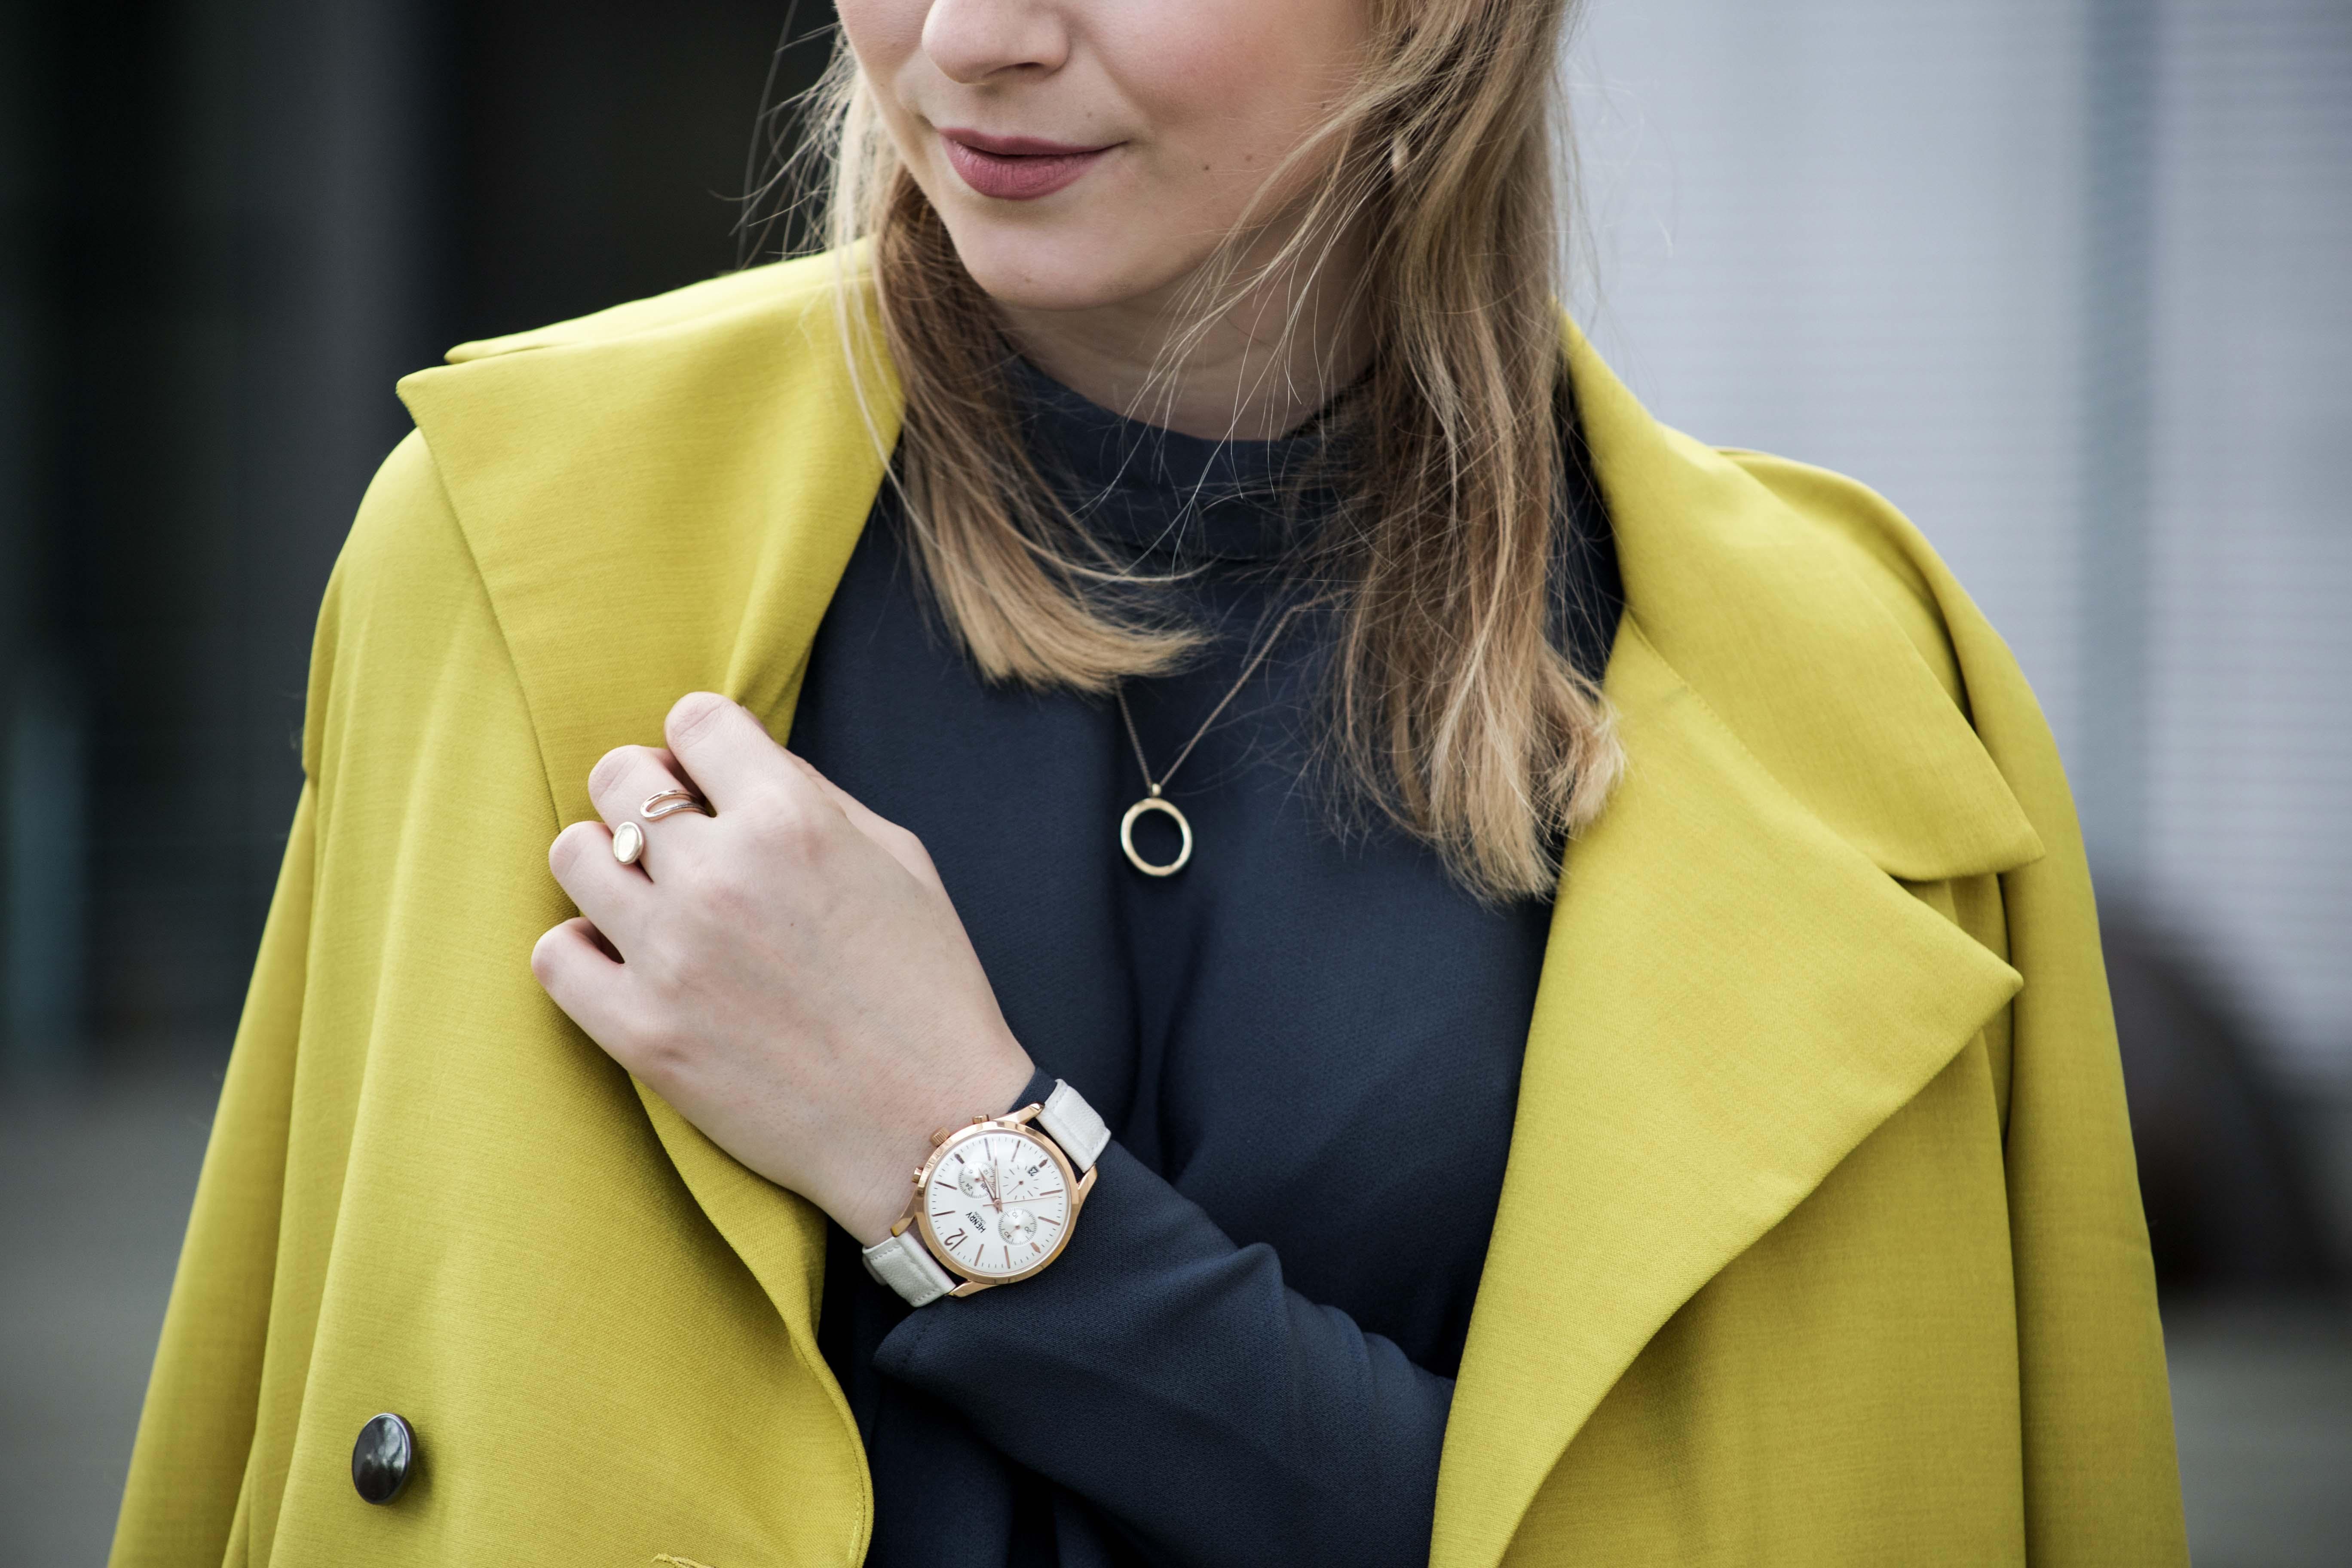 lemon-coat-volantkleid-herbstoutfit-fashionblog-modeblog-koeln-bonn-berlin_8148